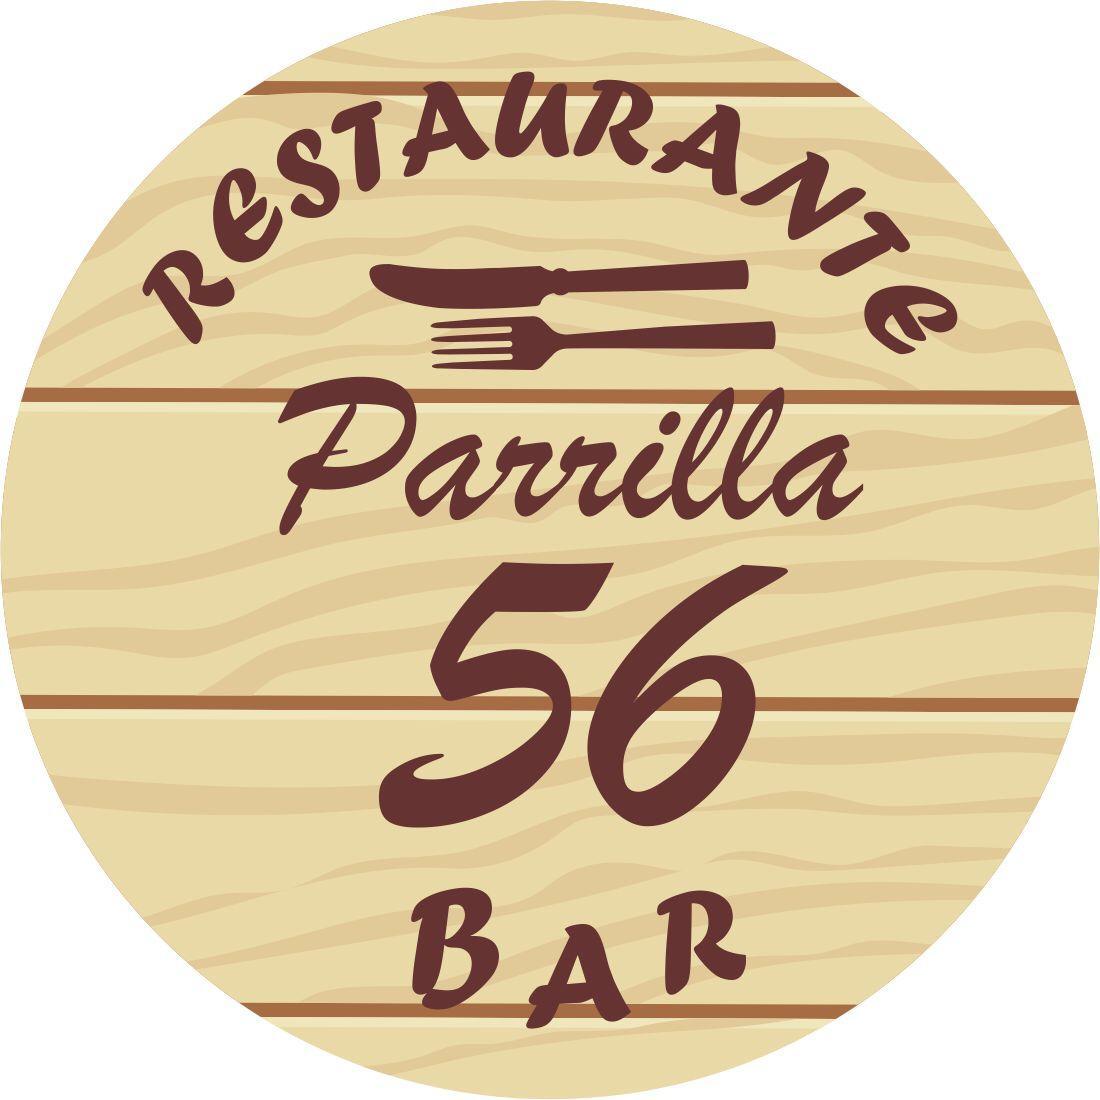 Restaurante bar Parrilla 56